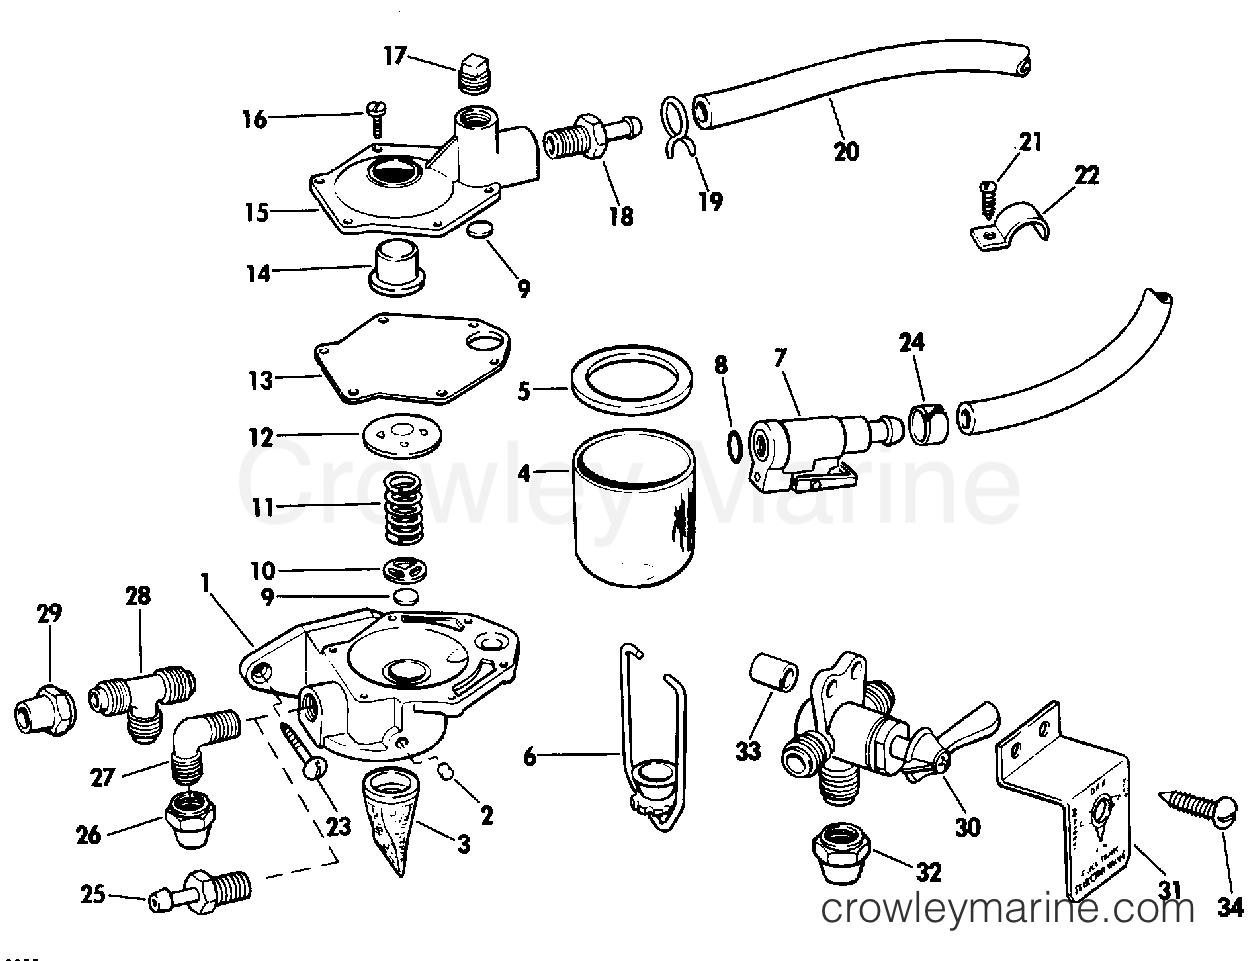 1979 Rigging Parts Accessories - Fuel System - PRIMER PUMP KIT